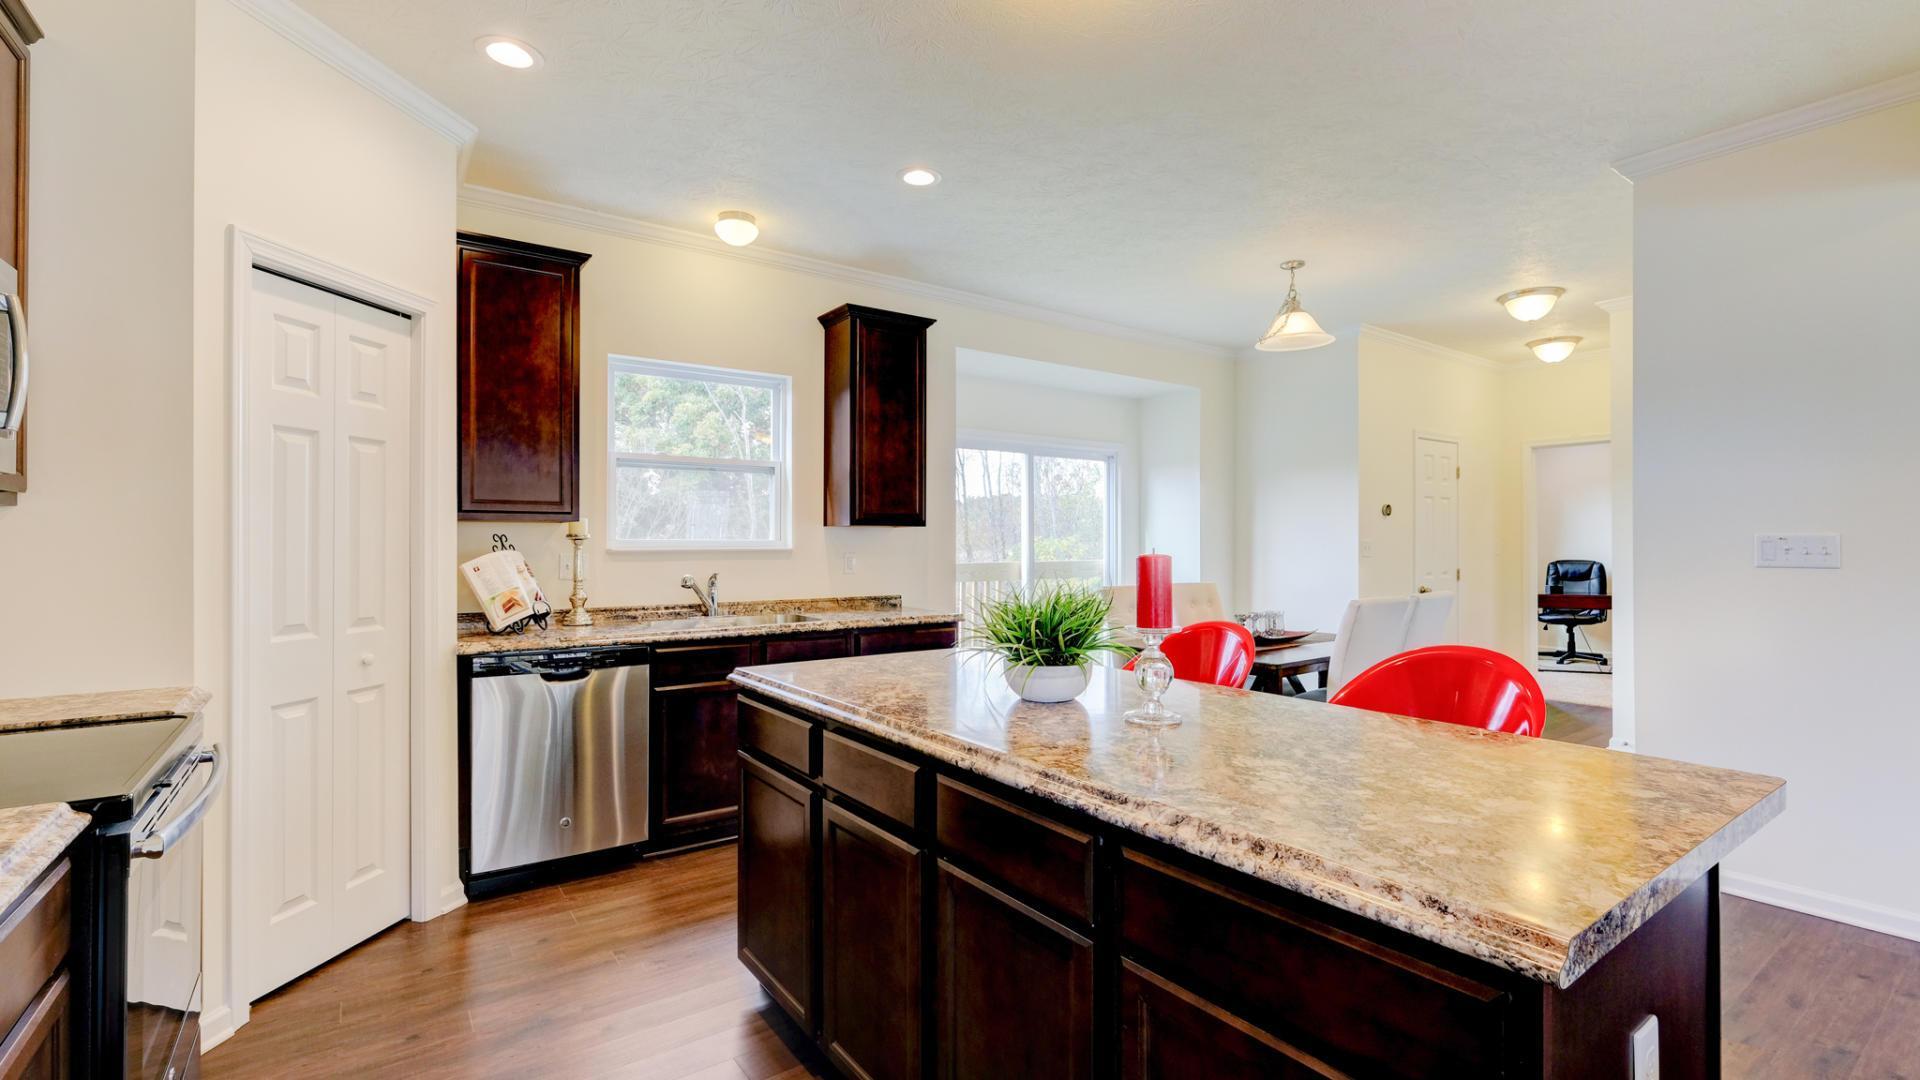 Kitchen featured in the Dallas By Maronda Homes in Cincinnati, OH